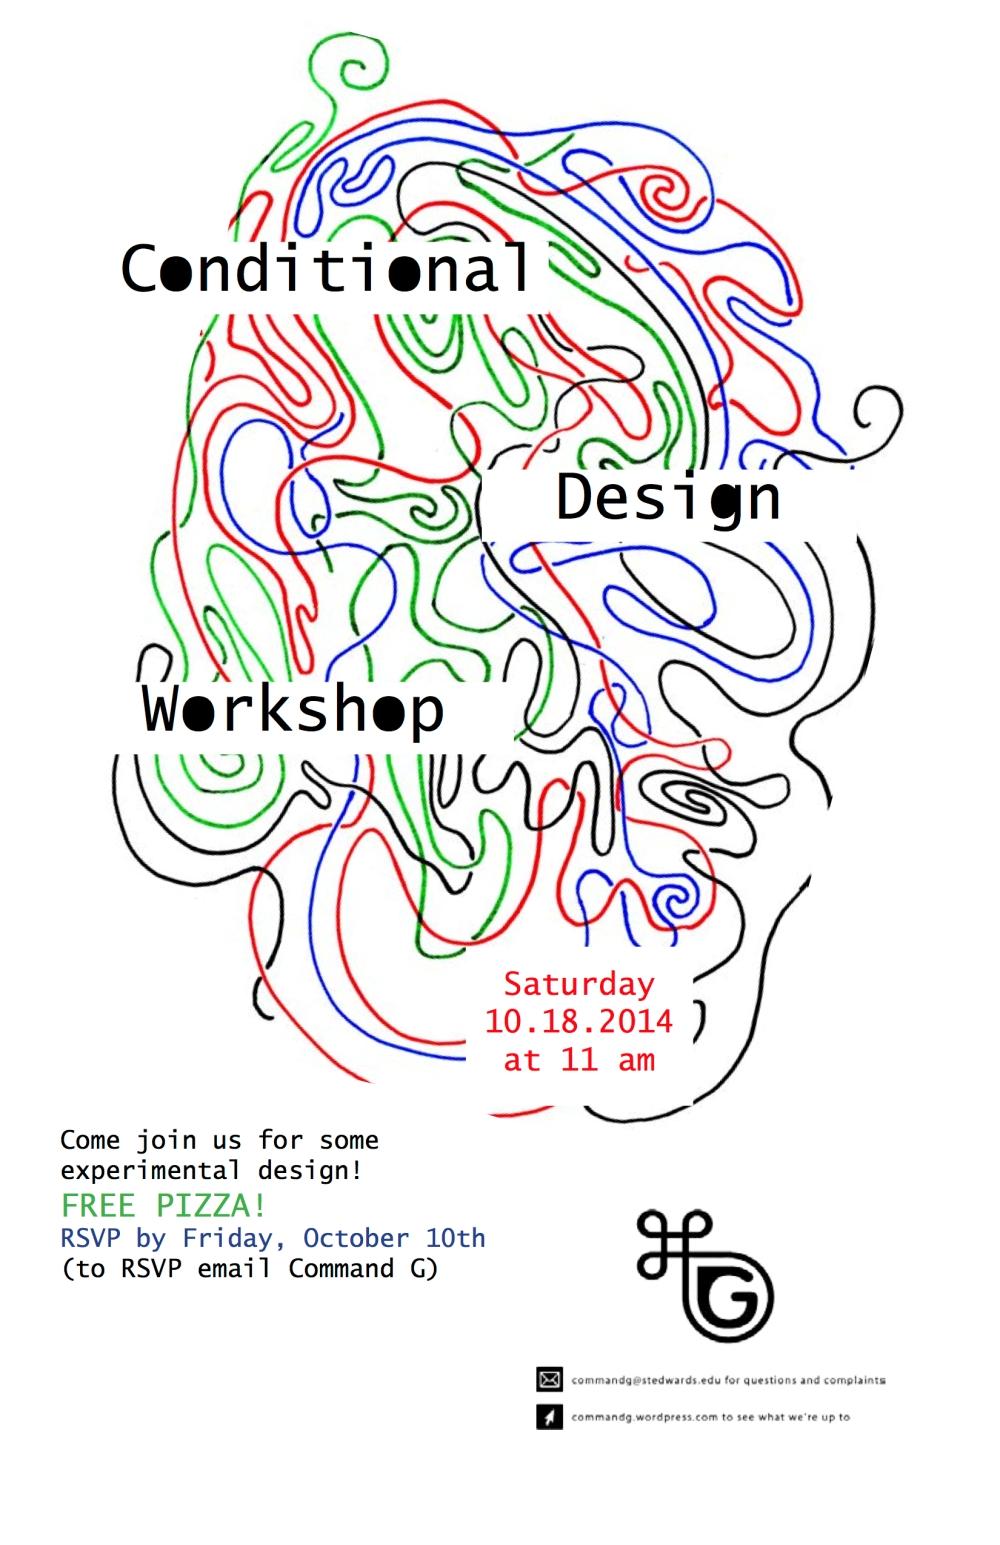 Conditional Design Workshop